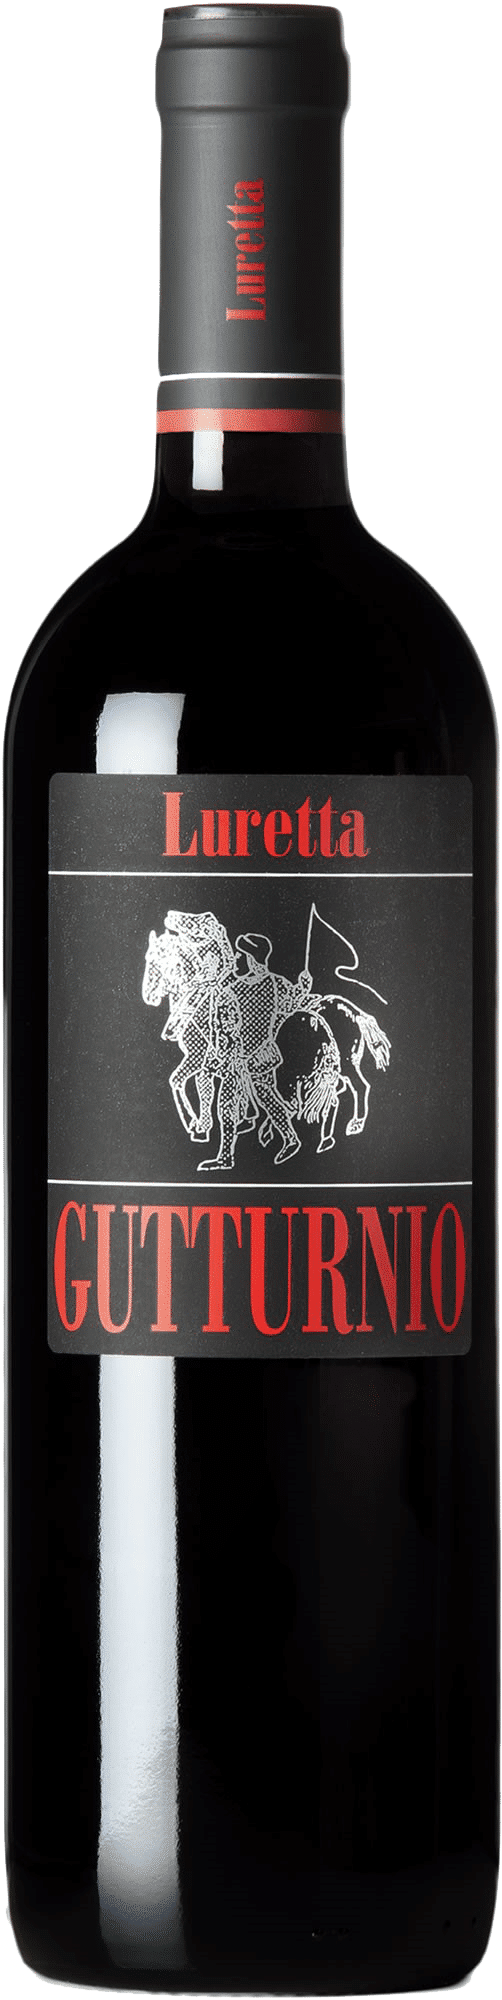 Luretta Gutturnio superiore | Italië | gemaakt van de druif: Barbera, Bonarda